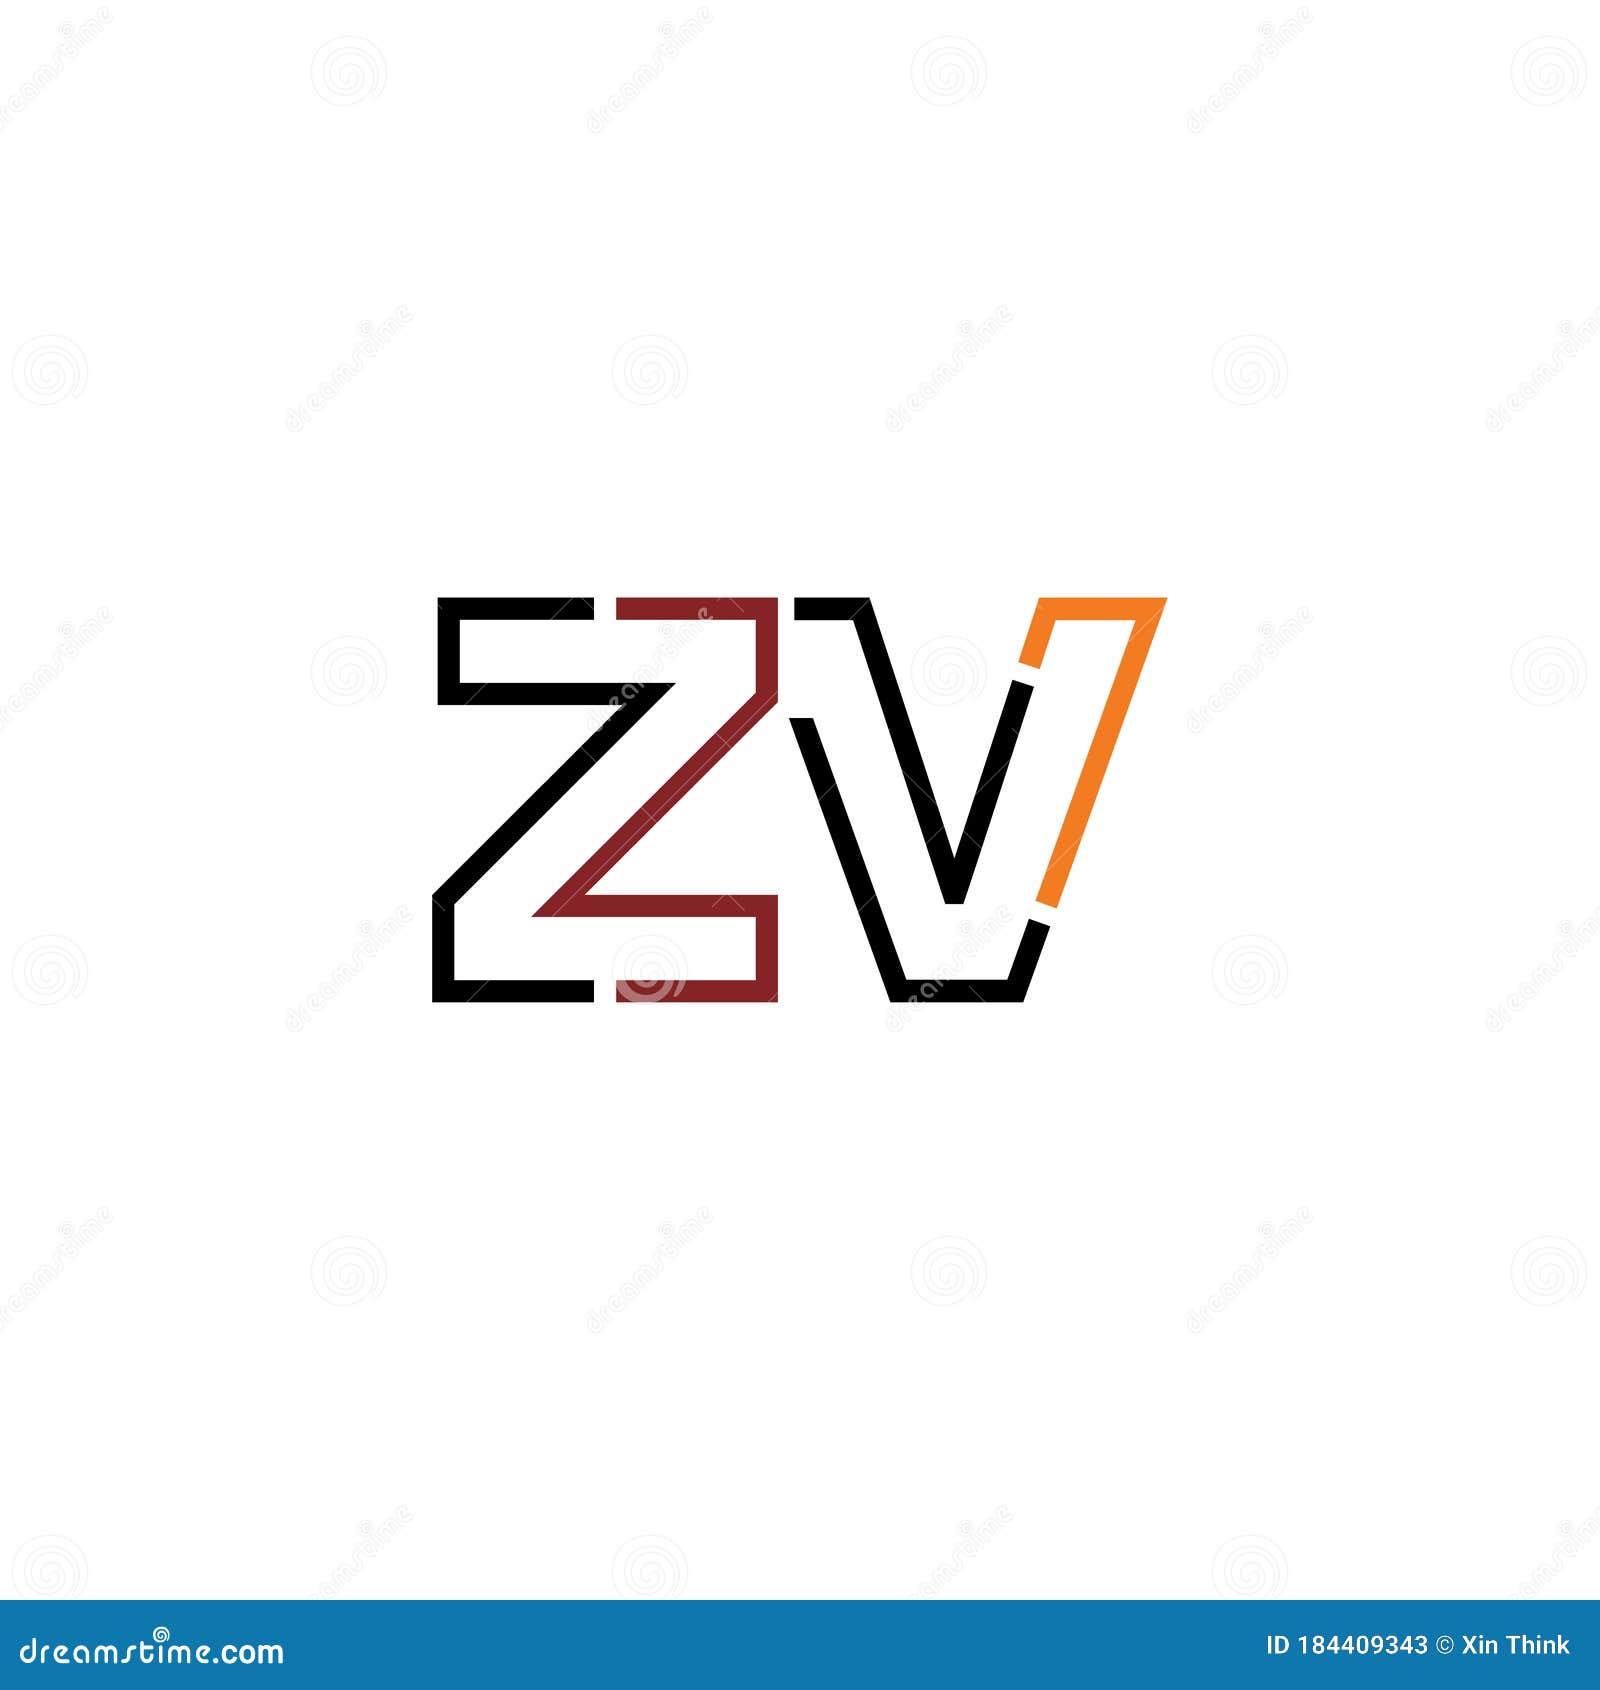 Zv Letter Logo Icon Design Template Elements Stock Vector Illustration Of Illustration Corporate 184409343